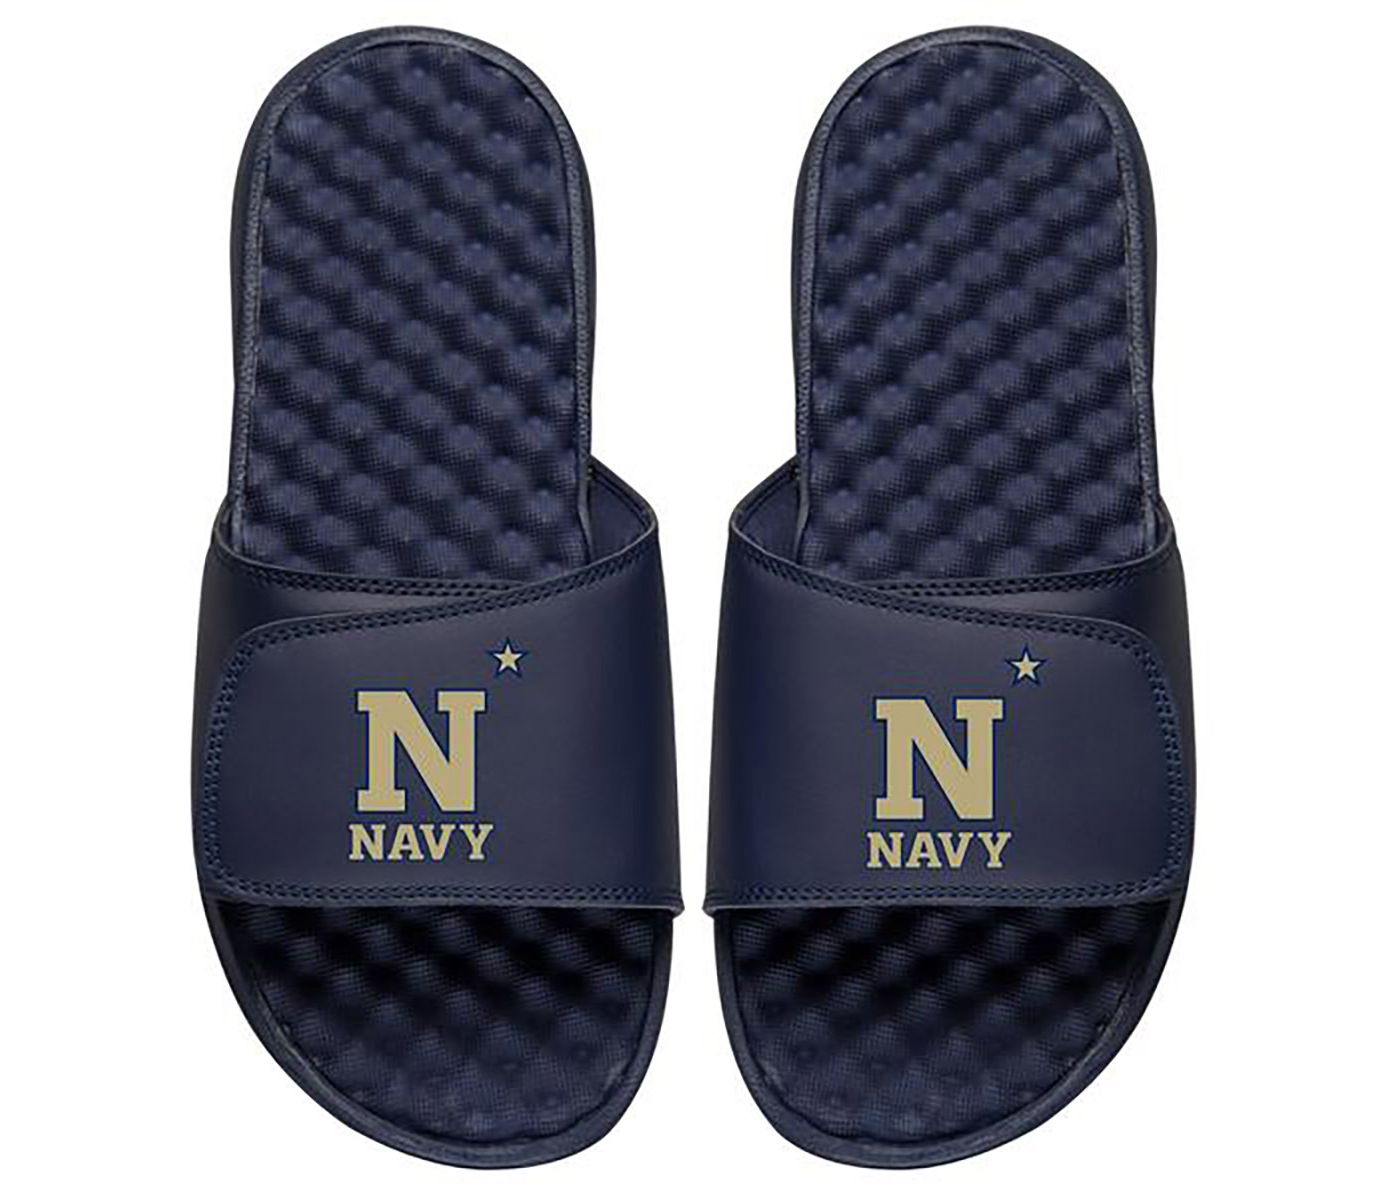 ISlide Navy Midshipmen Youth Sandals